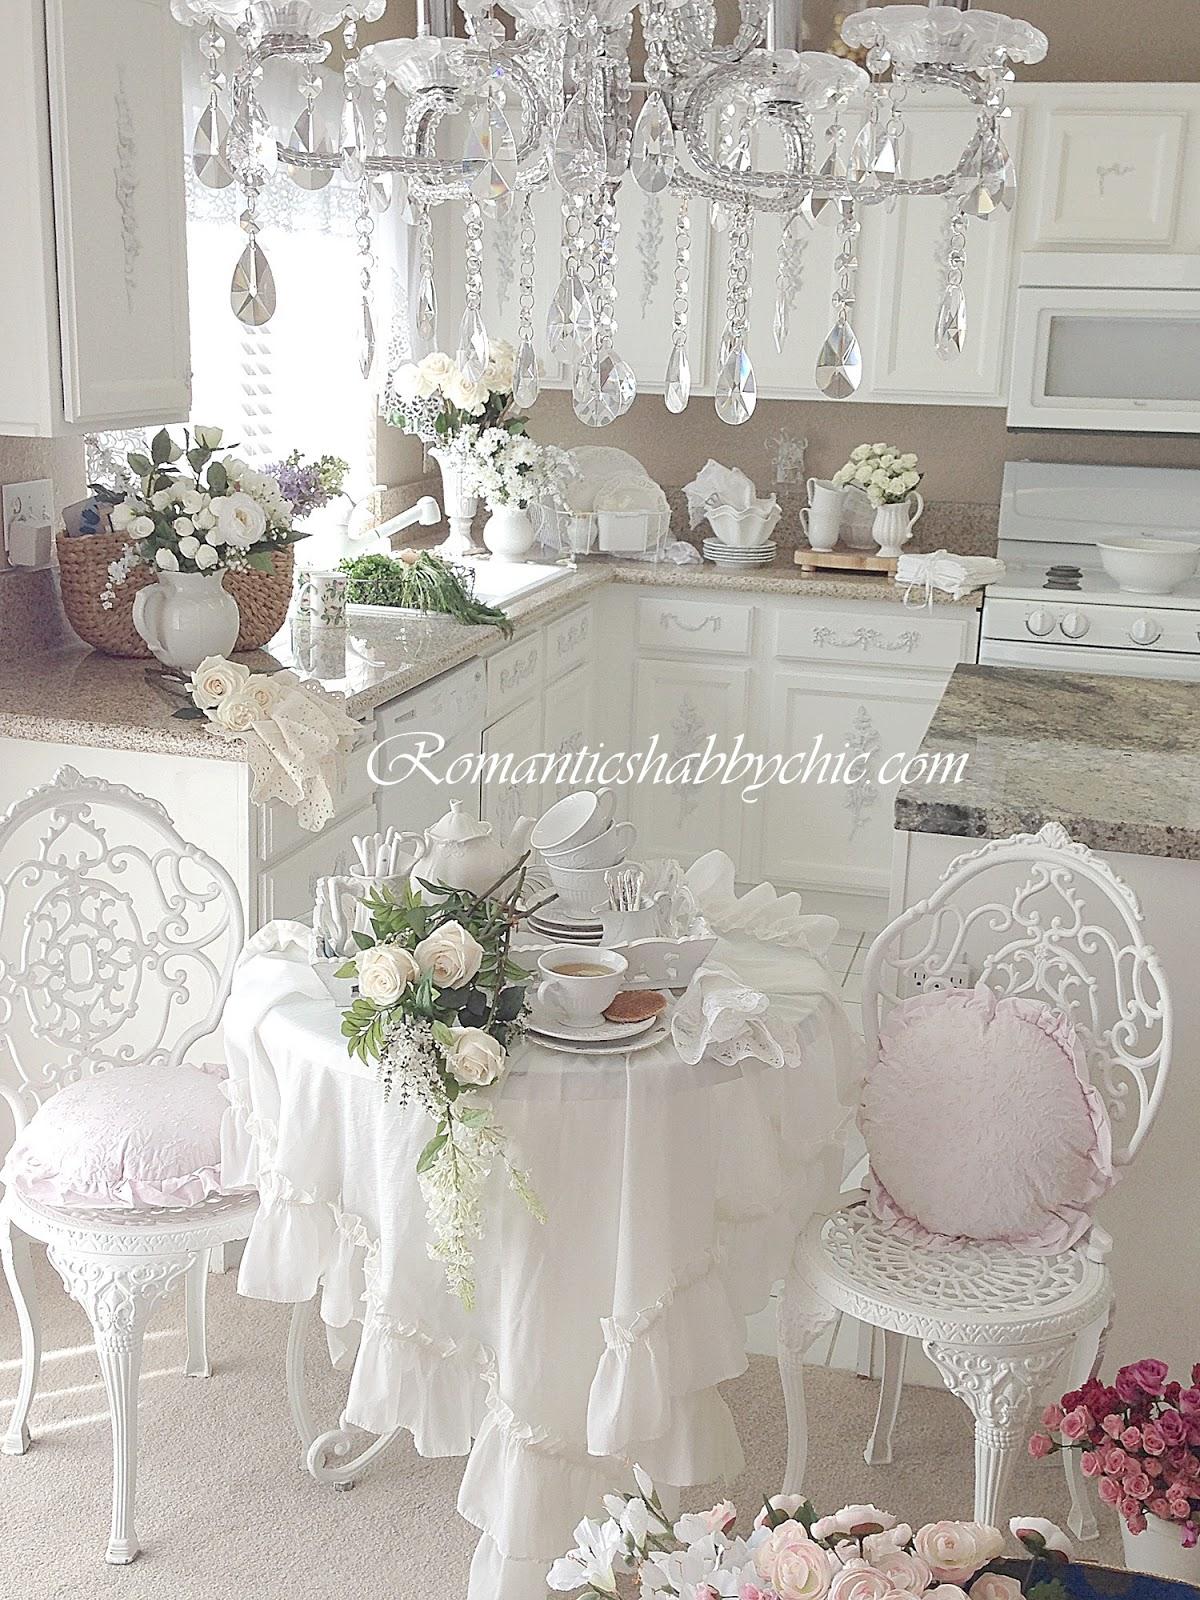 Shabby Chic And Eclectic Decorating Living Room: Romantik Evim ~Romantik Ev: My